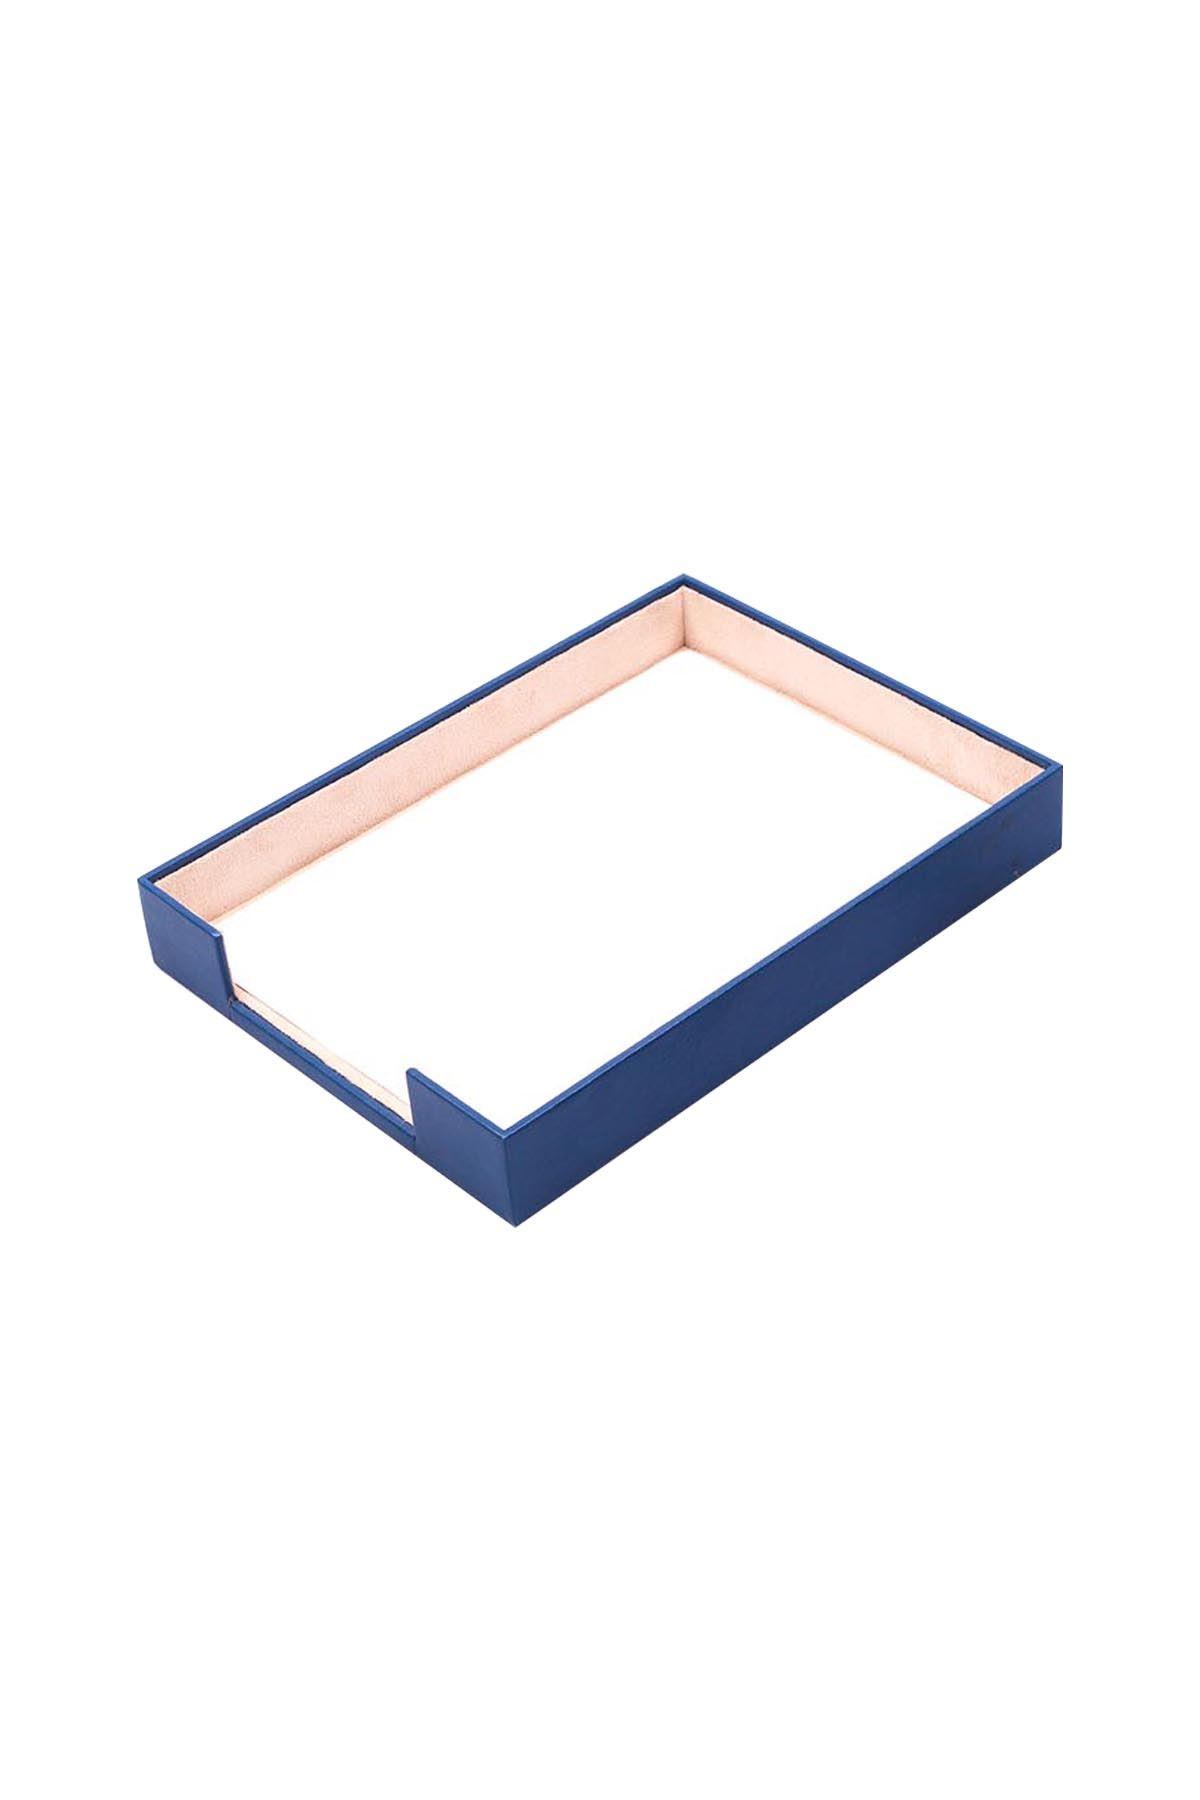 Document Tray Blue| Leather Document Organizer | Leather Tray | Leather Organizer | Document Shelf